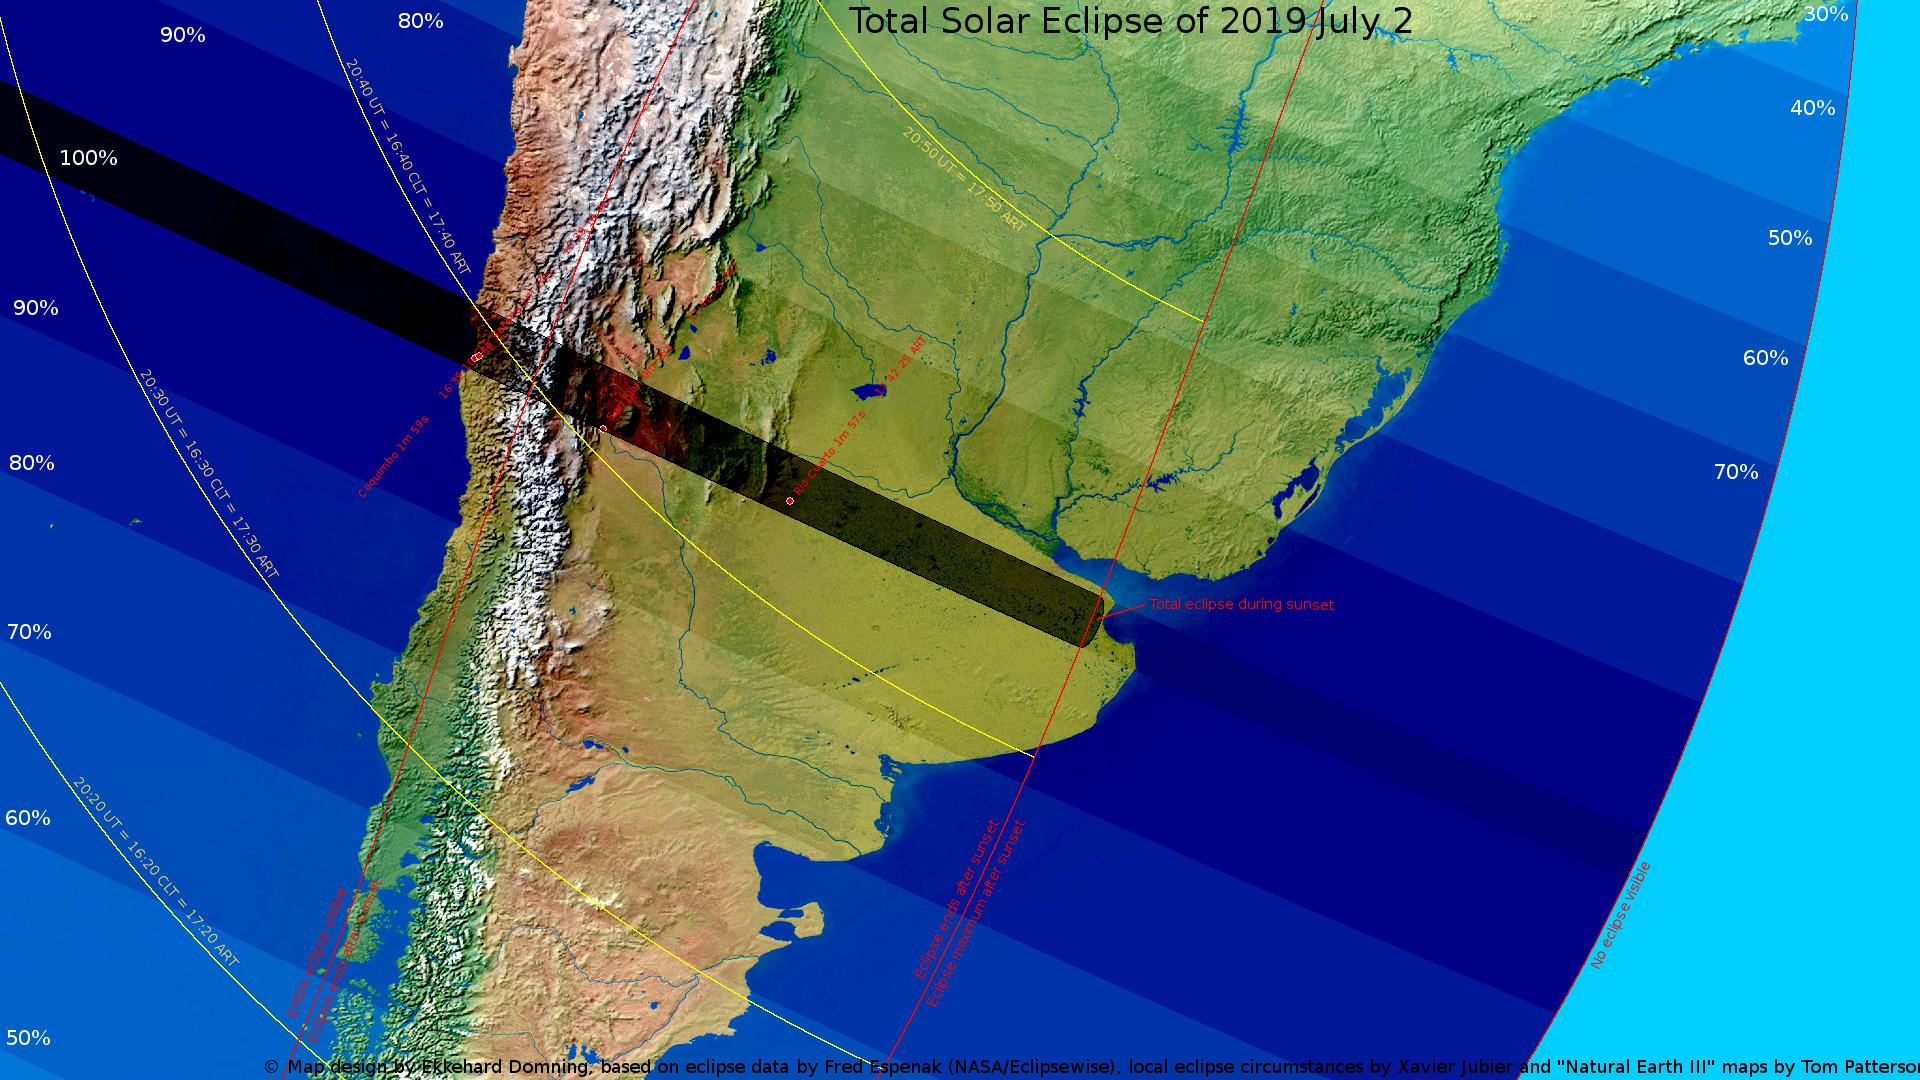 eclipse-totale-2-juillet-2019-soleil-bande-de-totalite